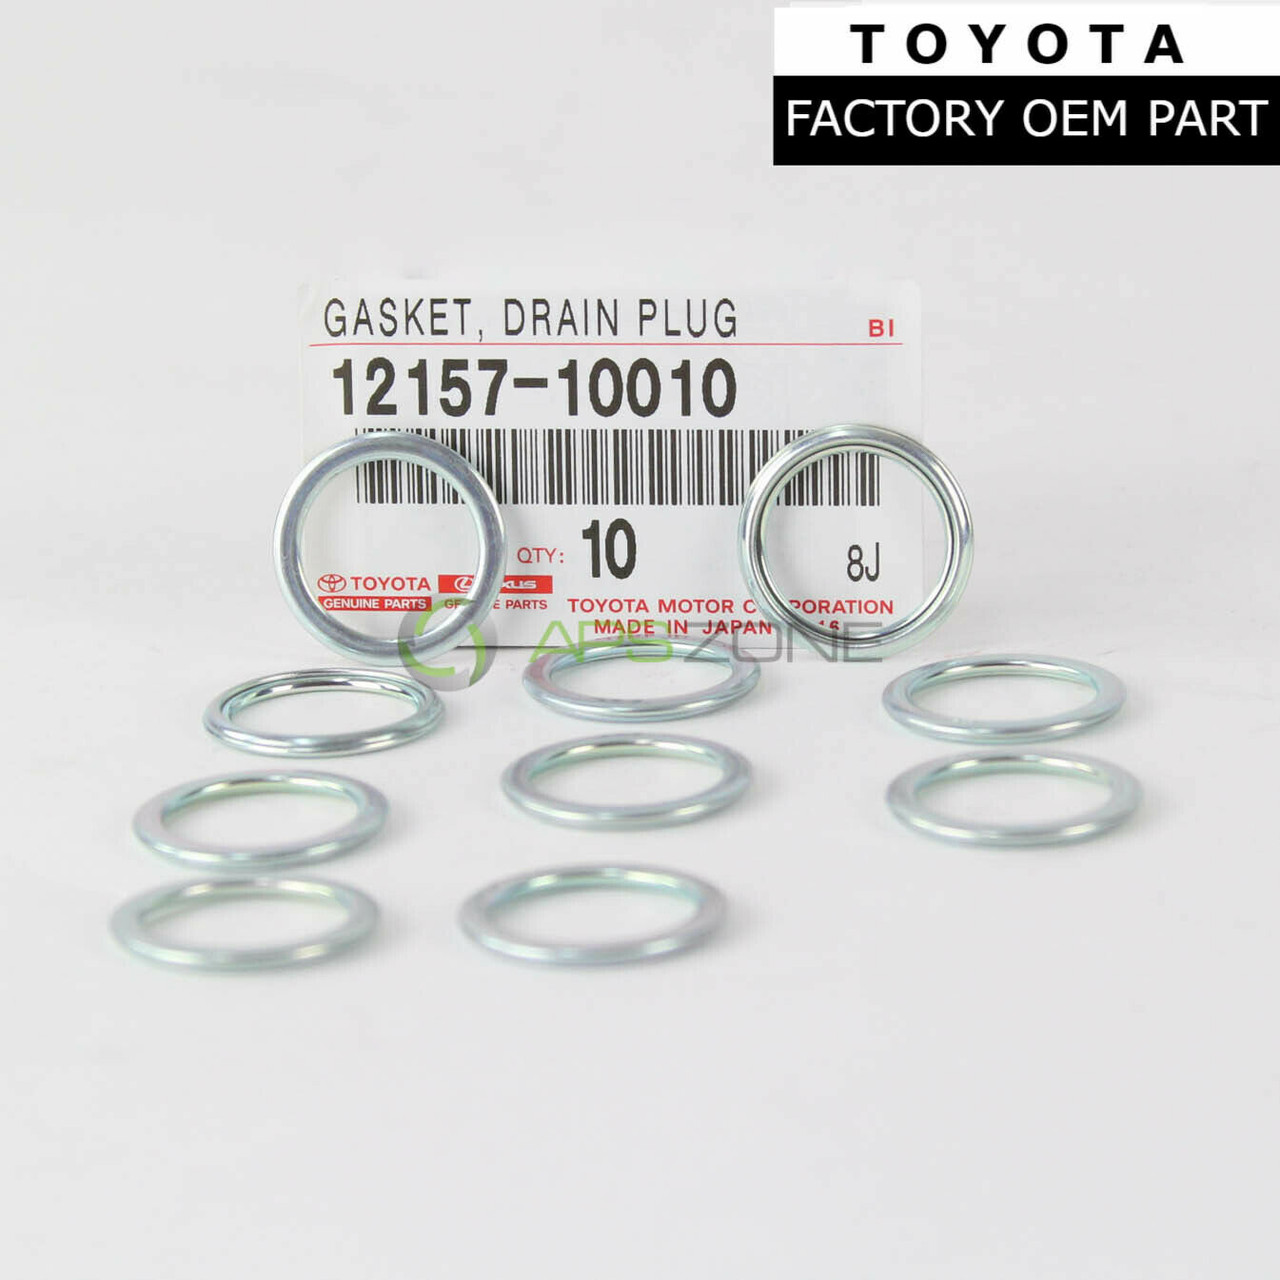 OEM FACTORY TOYOTA DRAIN PLUG GASKET WASHER SET OF 10 90430-18008